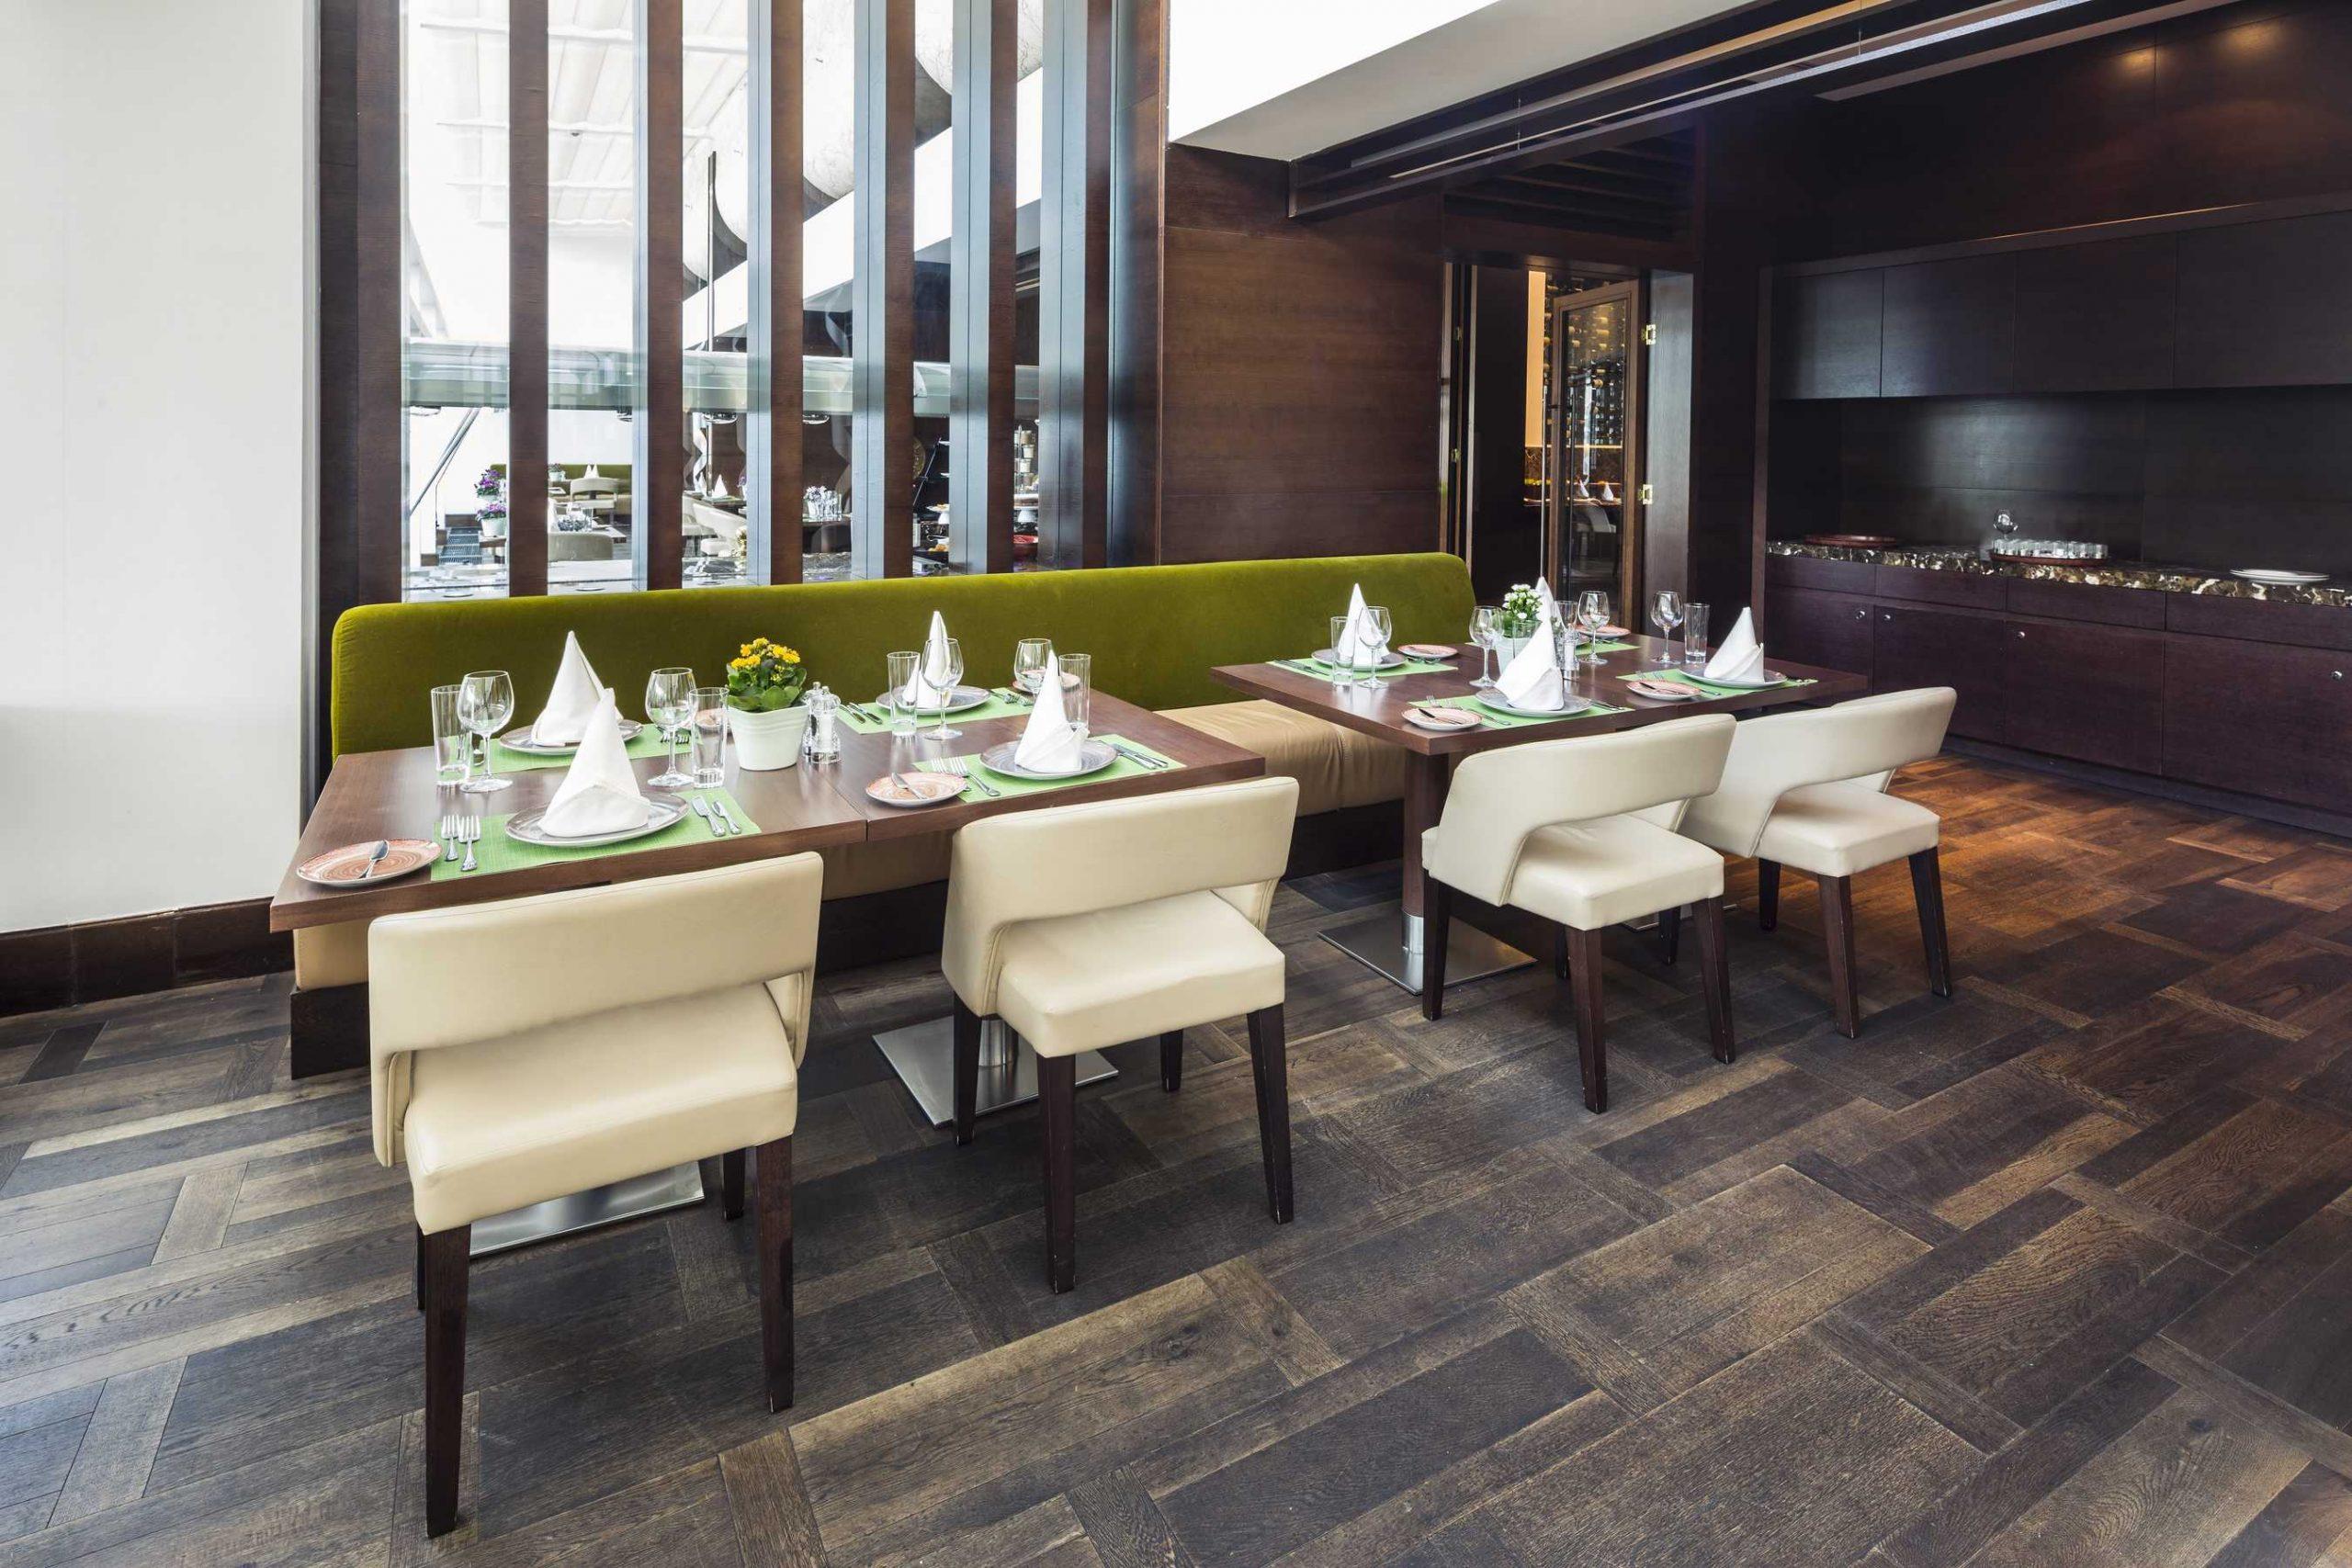 restaurant floor coverings in commercial remodeling contractors project